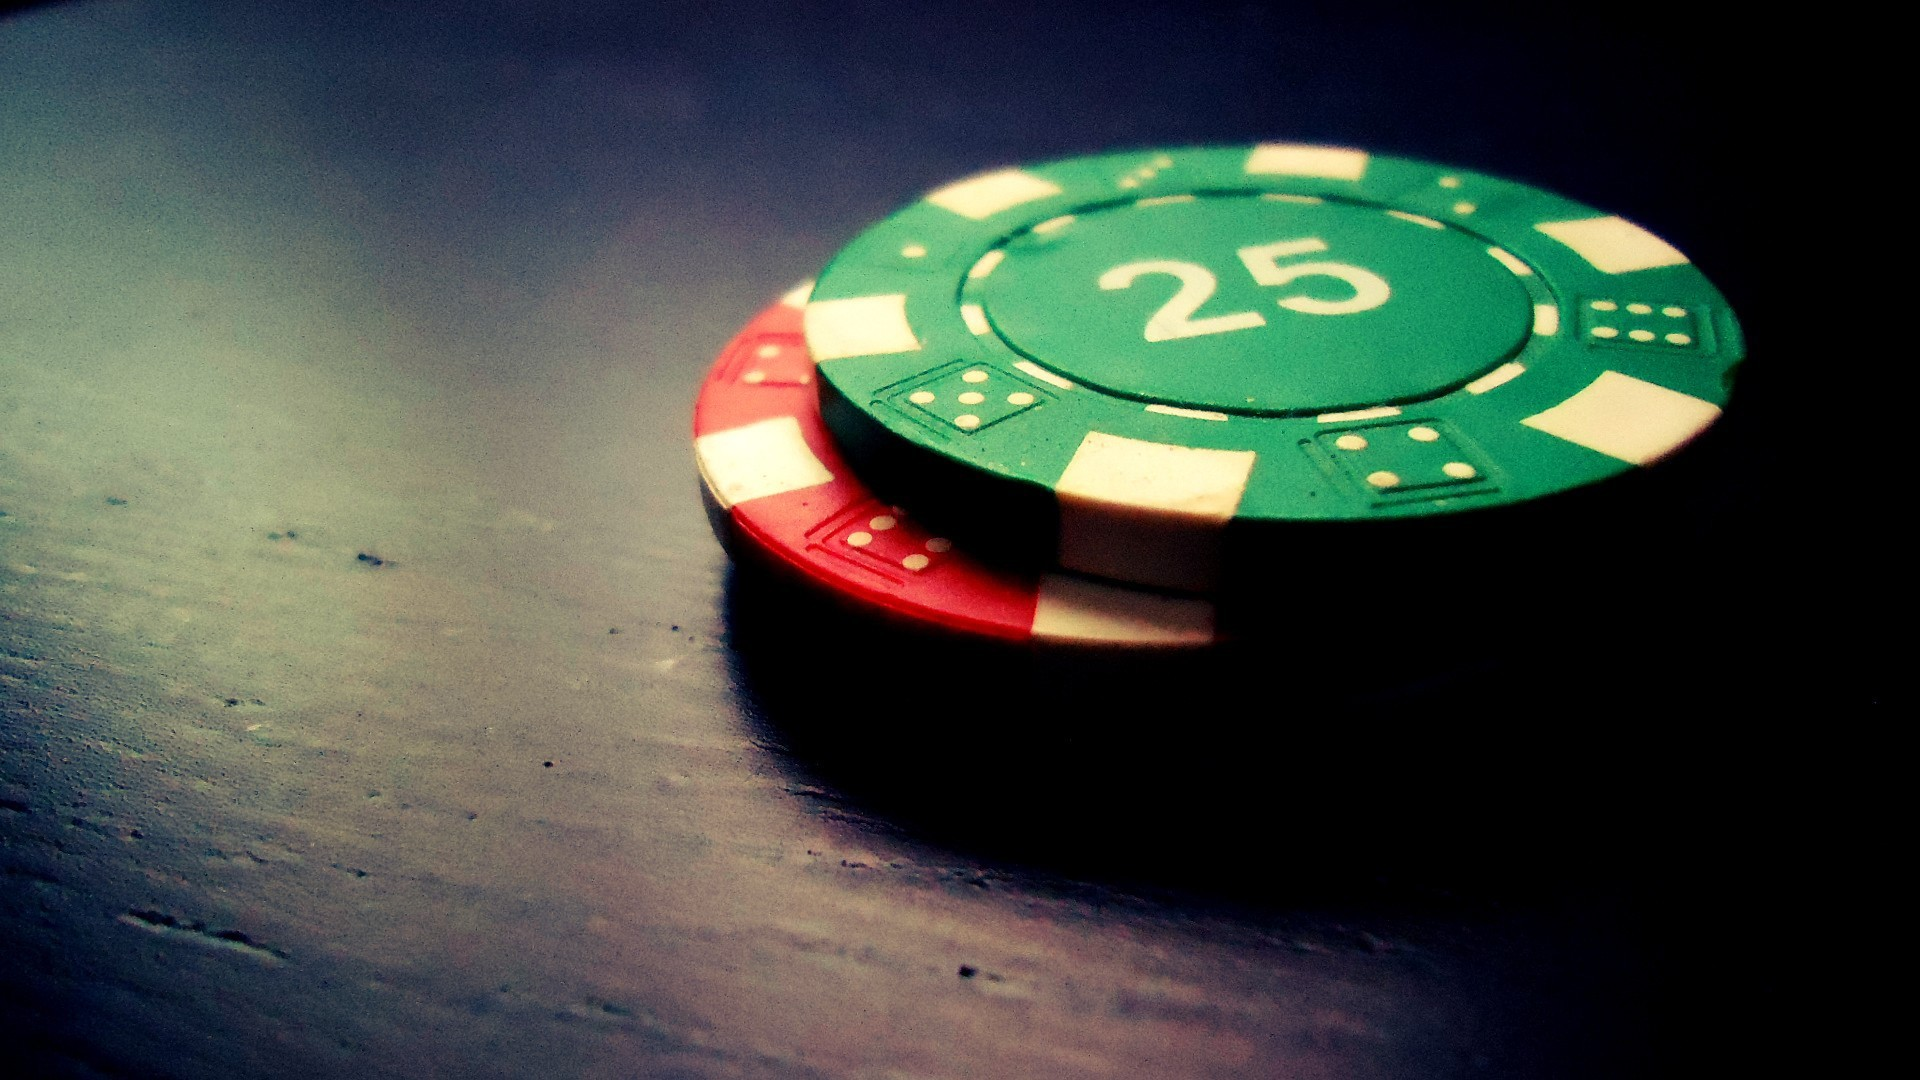 Res: 1920x1080, Poker HD Wallpaper | Hintergrund |  | ID:321988 - Wallpaper Abyss